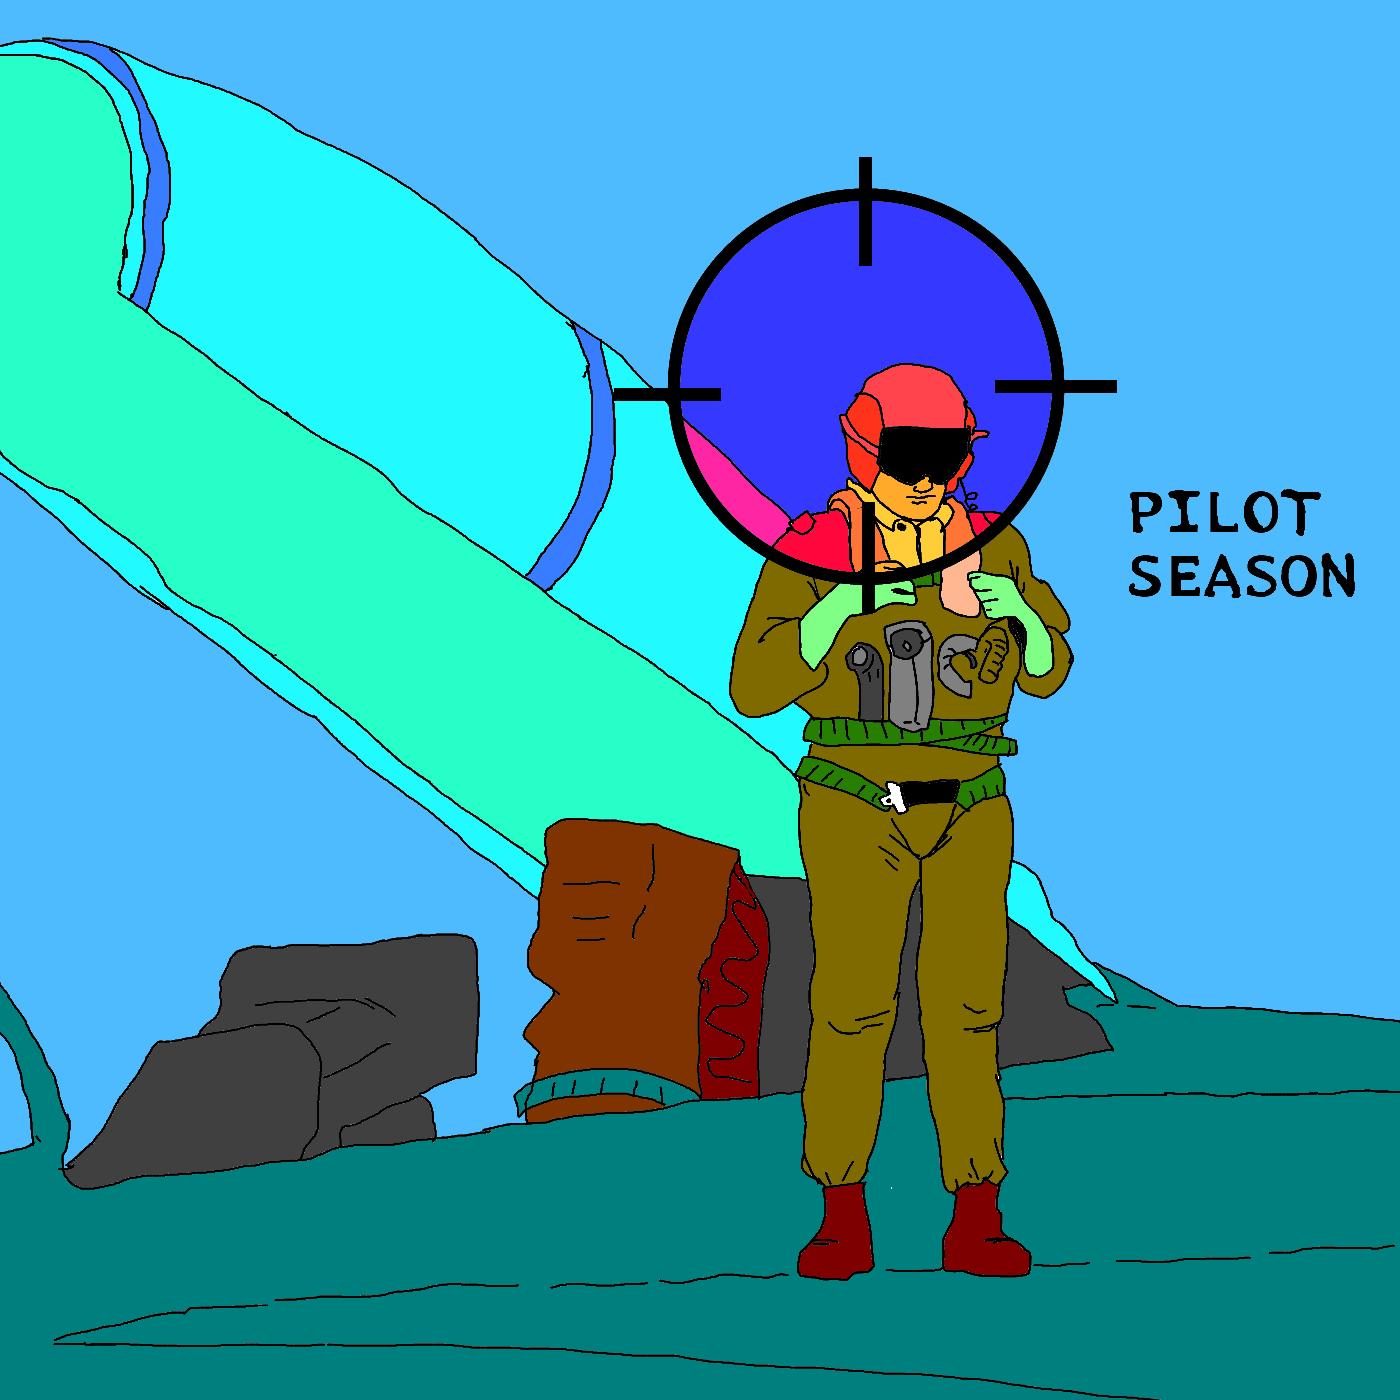 Pilot Season!